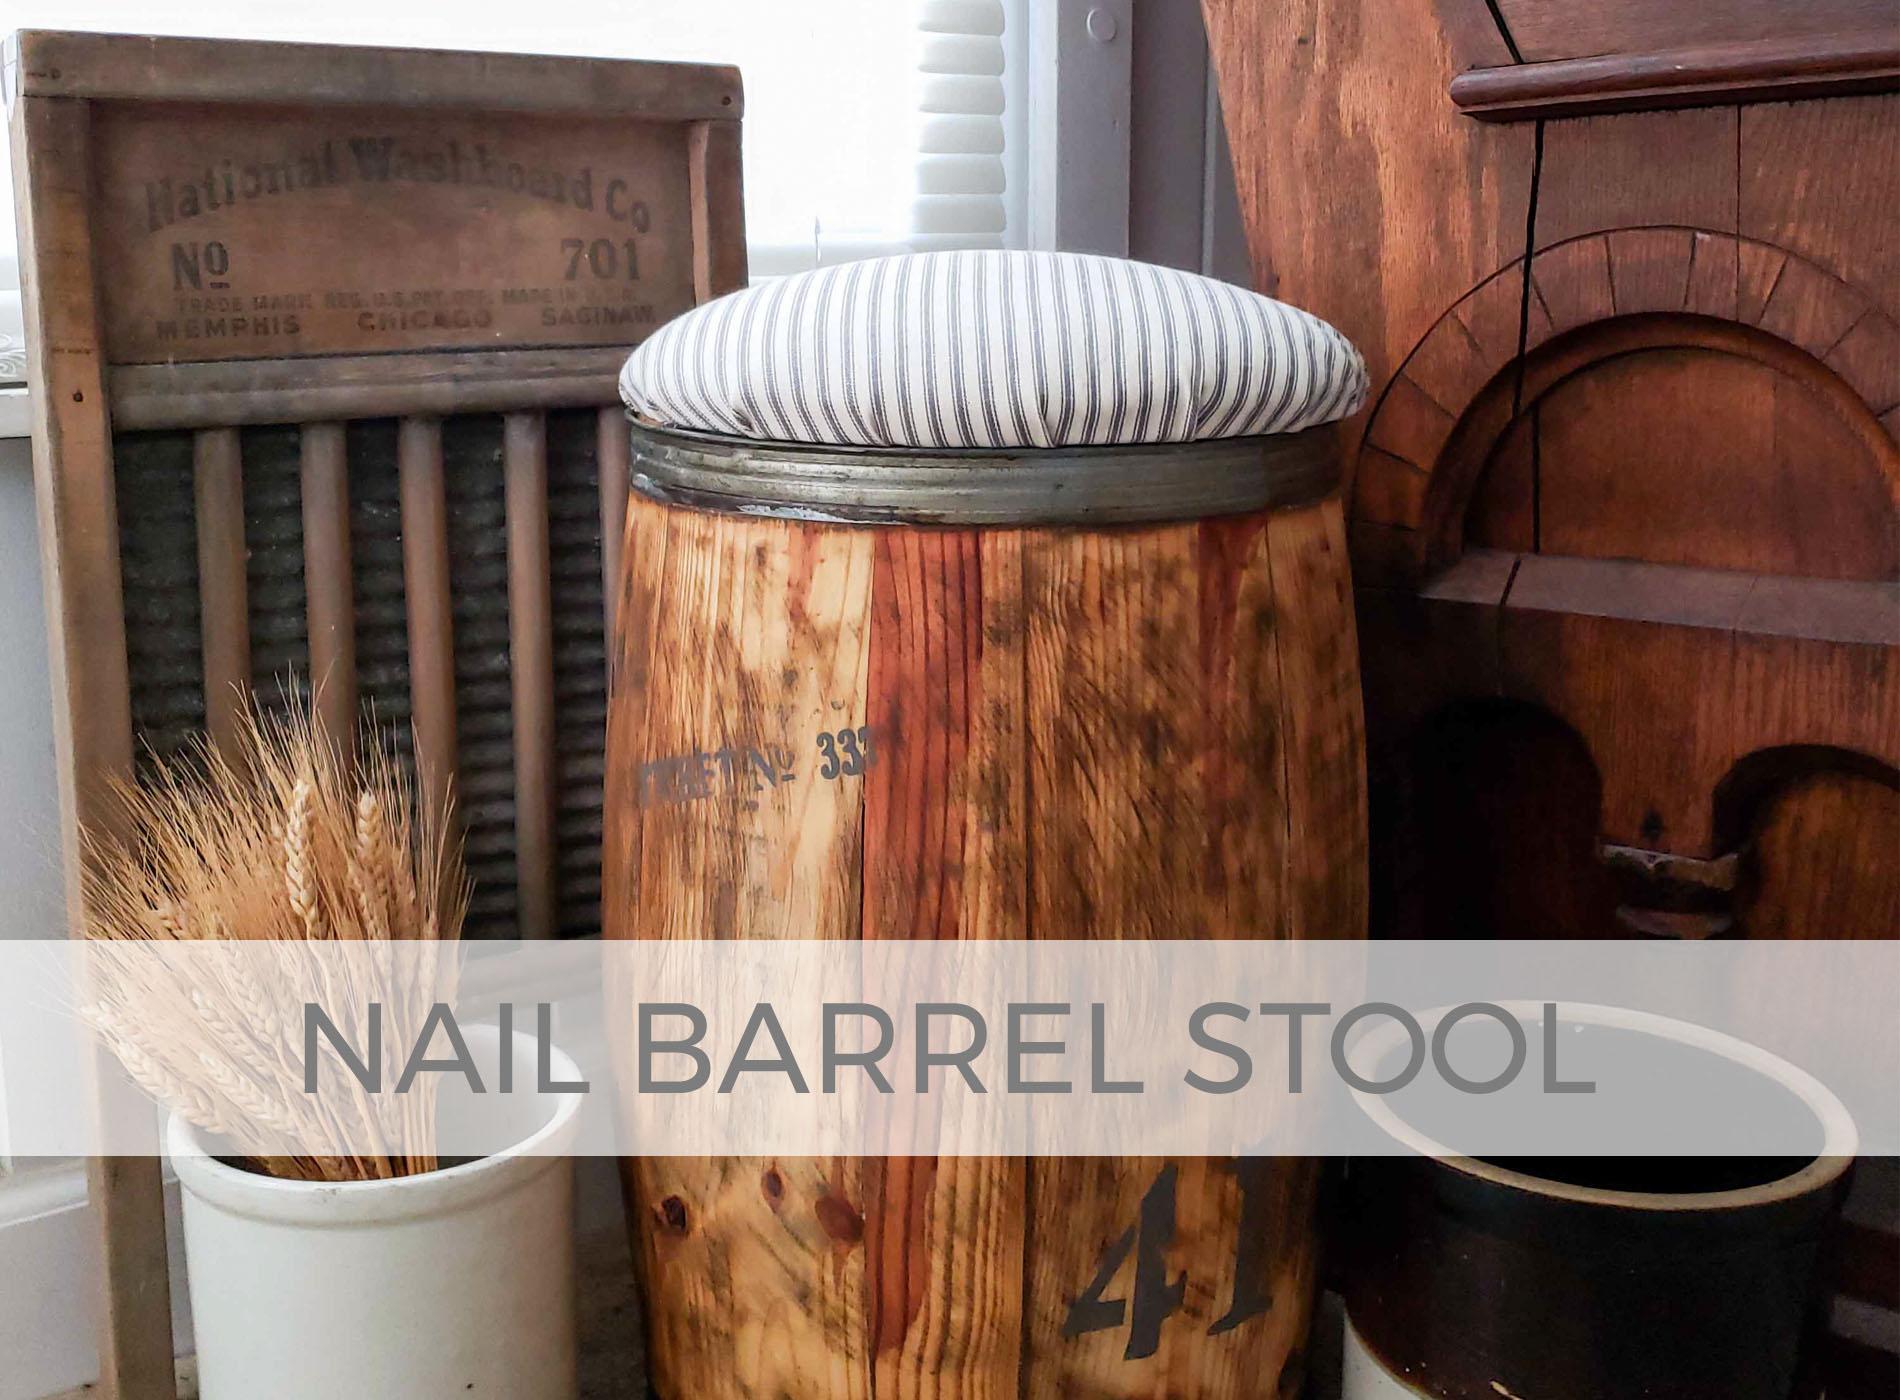 DIY Nail Barrel Stool by Larissa of Prodigal Pieces | prodigalpieces.com